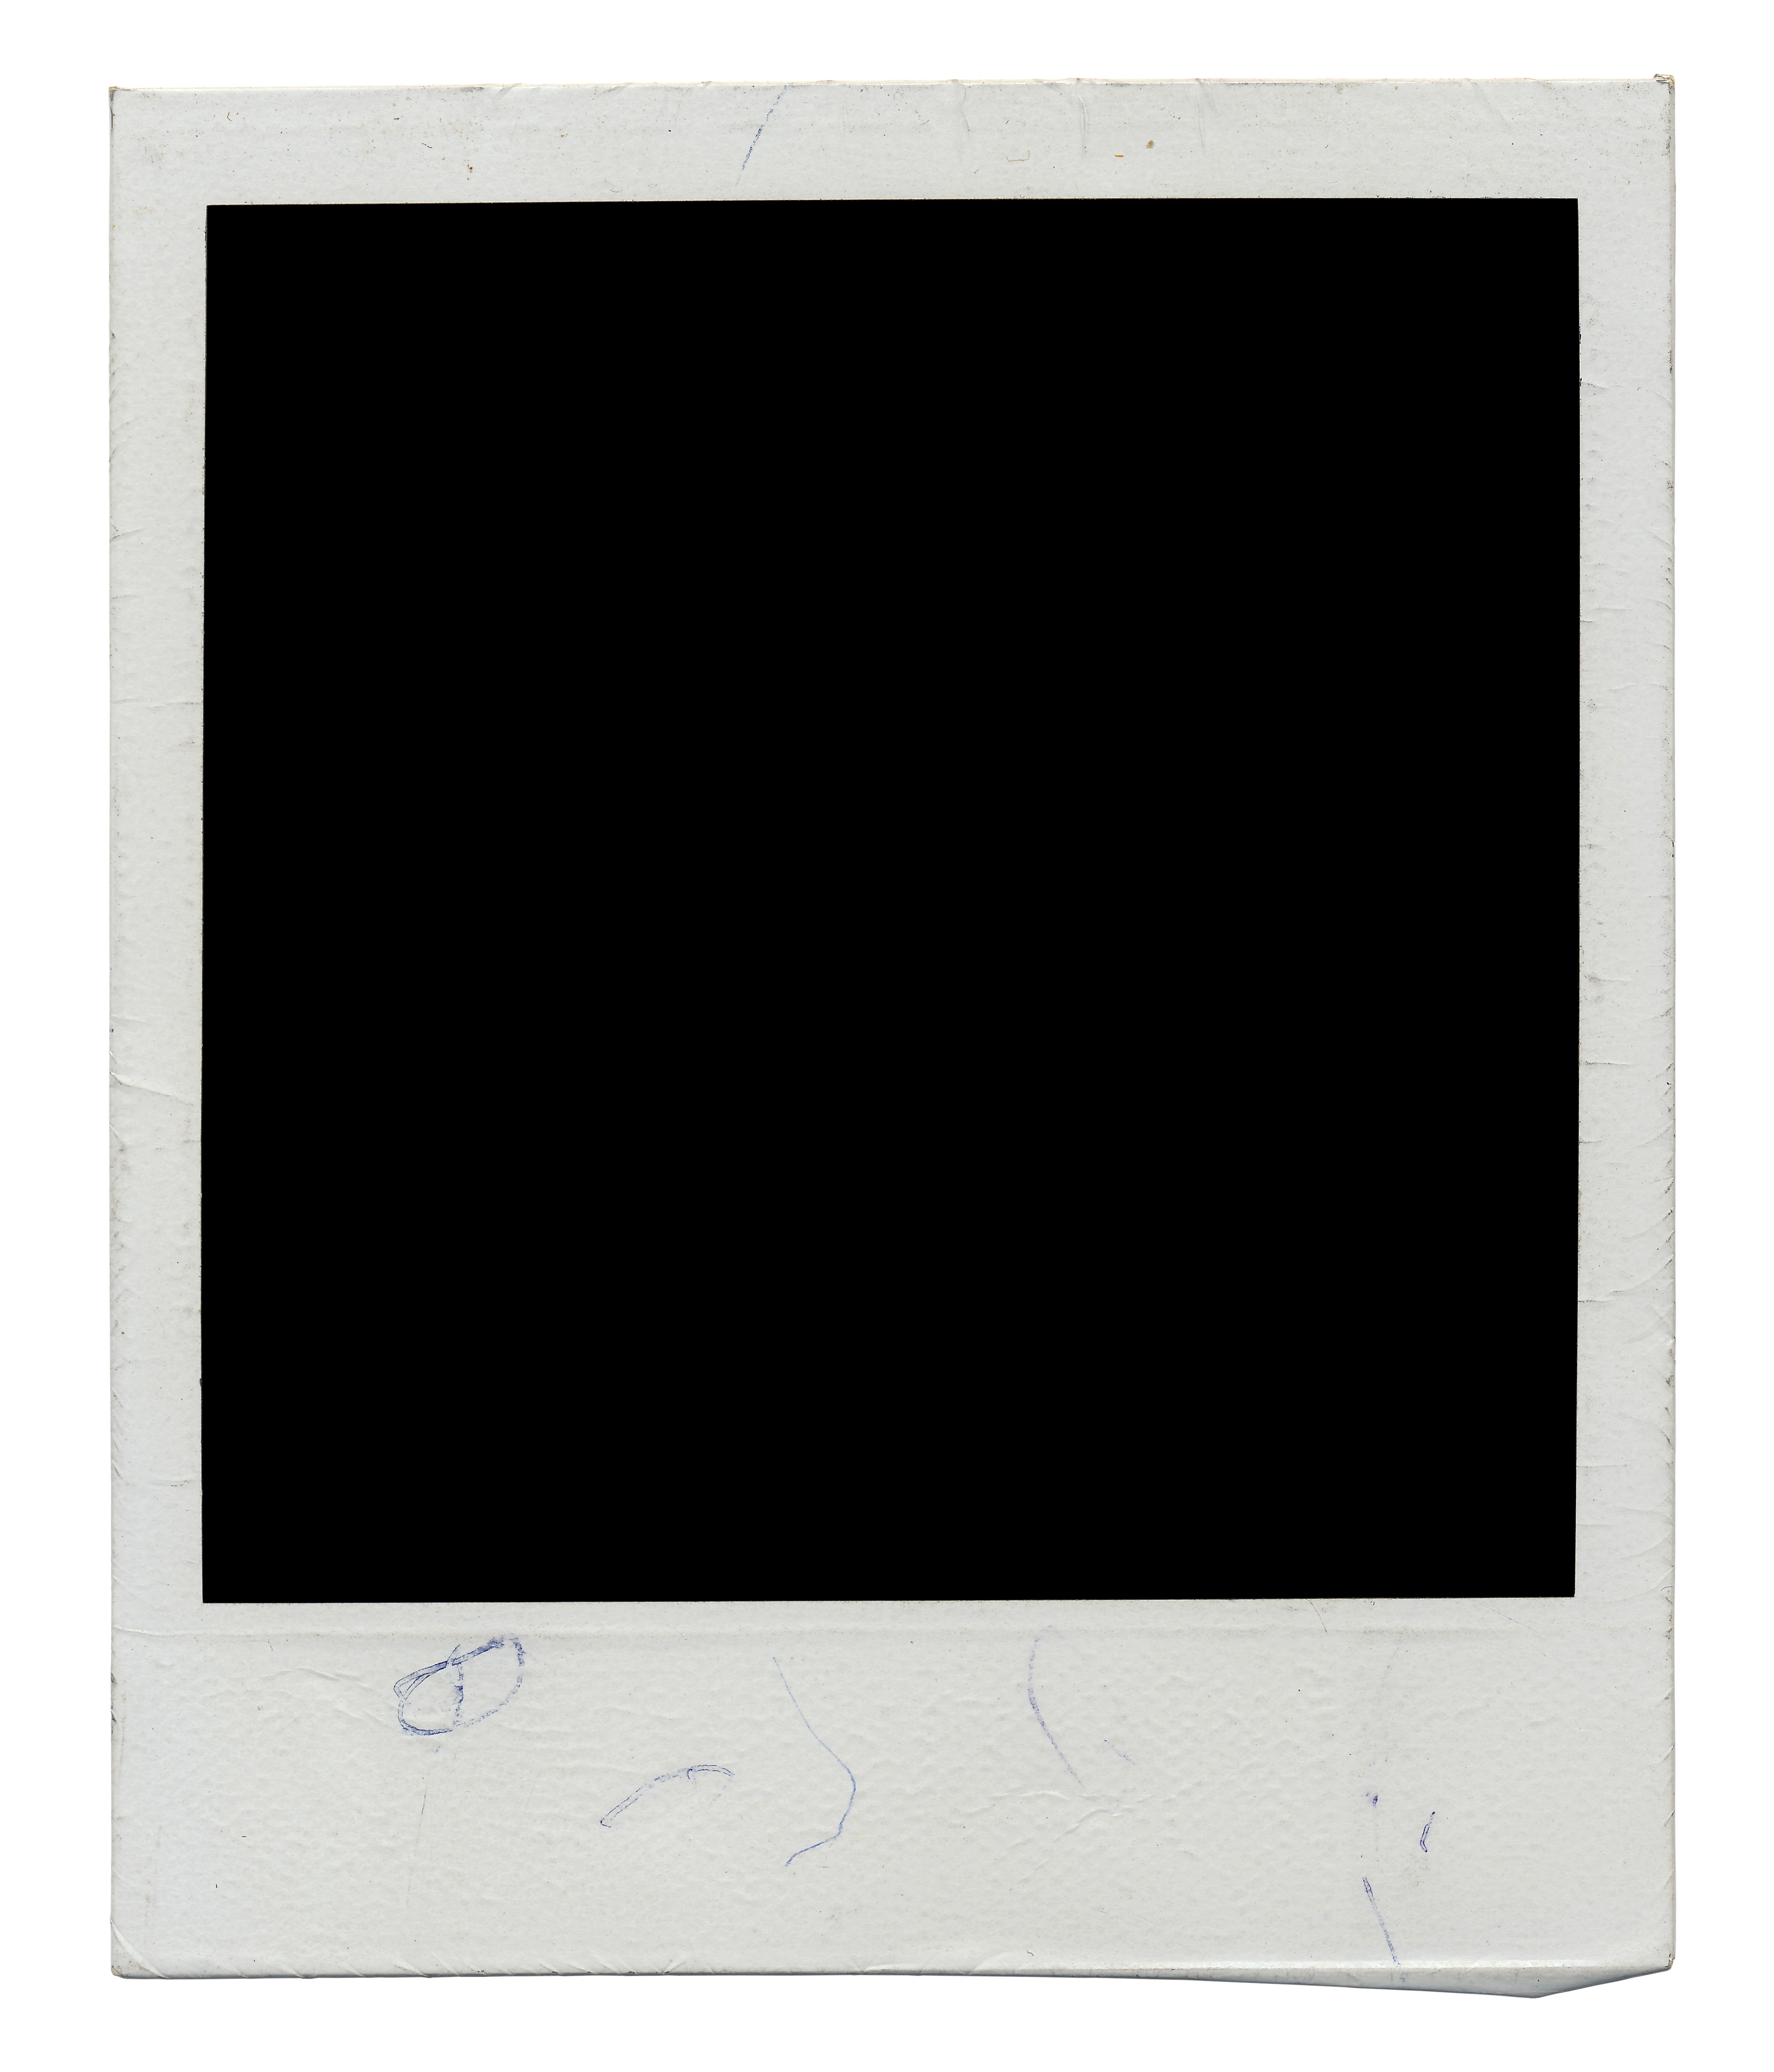 Index of /geekgirls/temp/img/fzm-Blank-Polaroid-Frame-Images